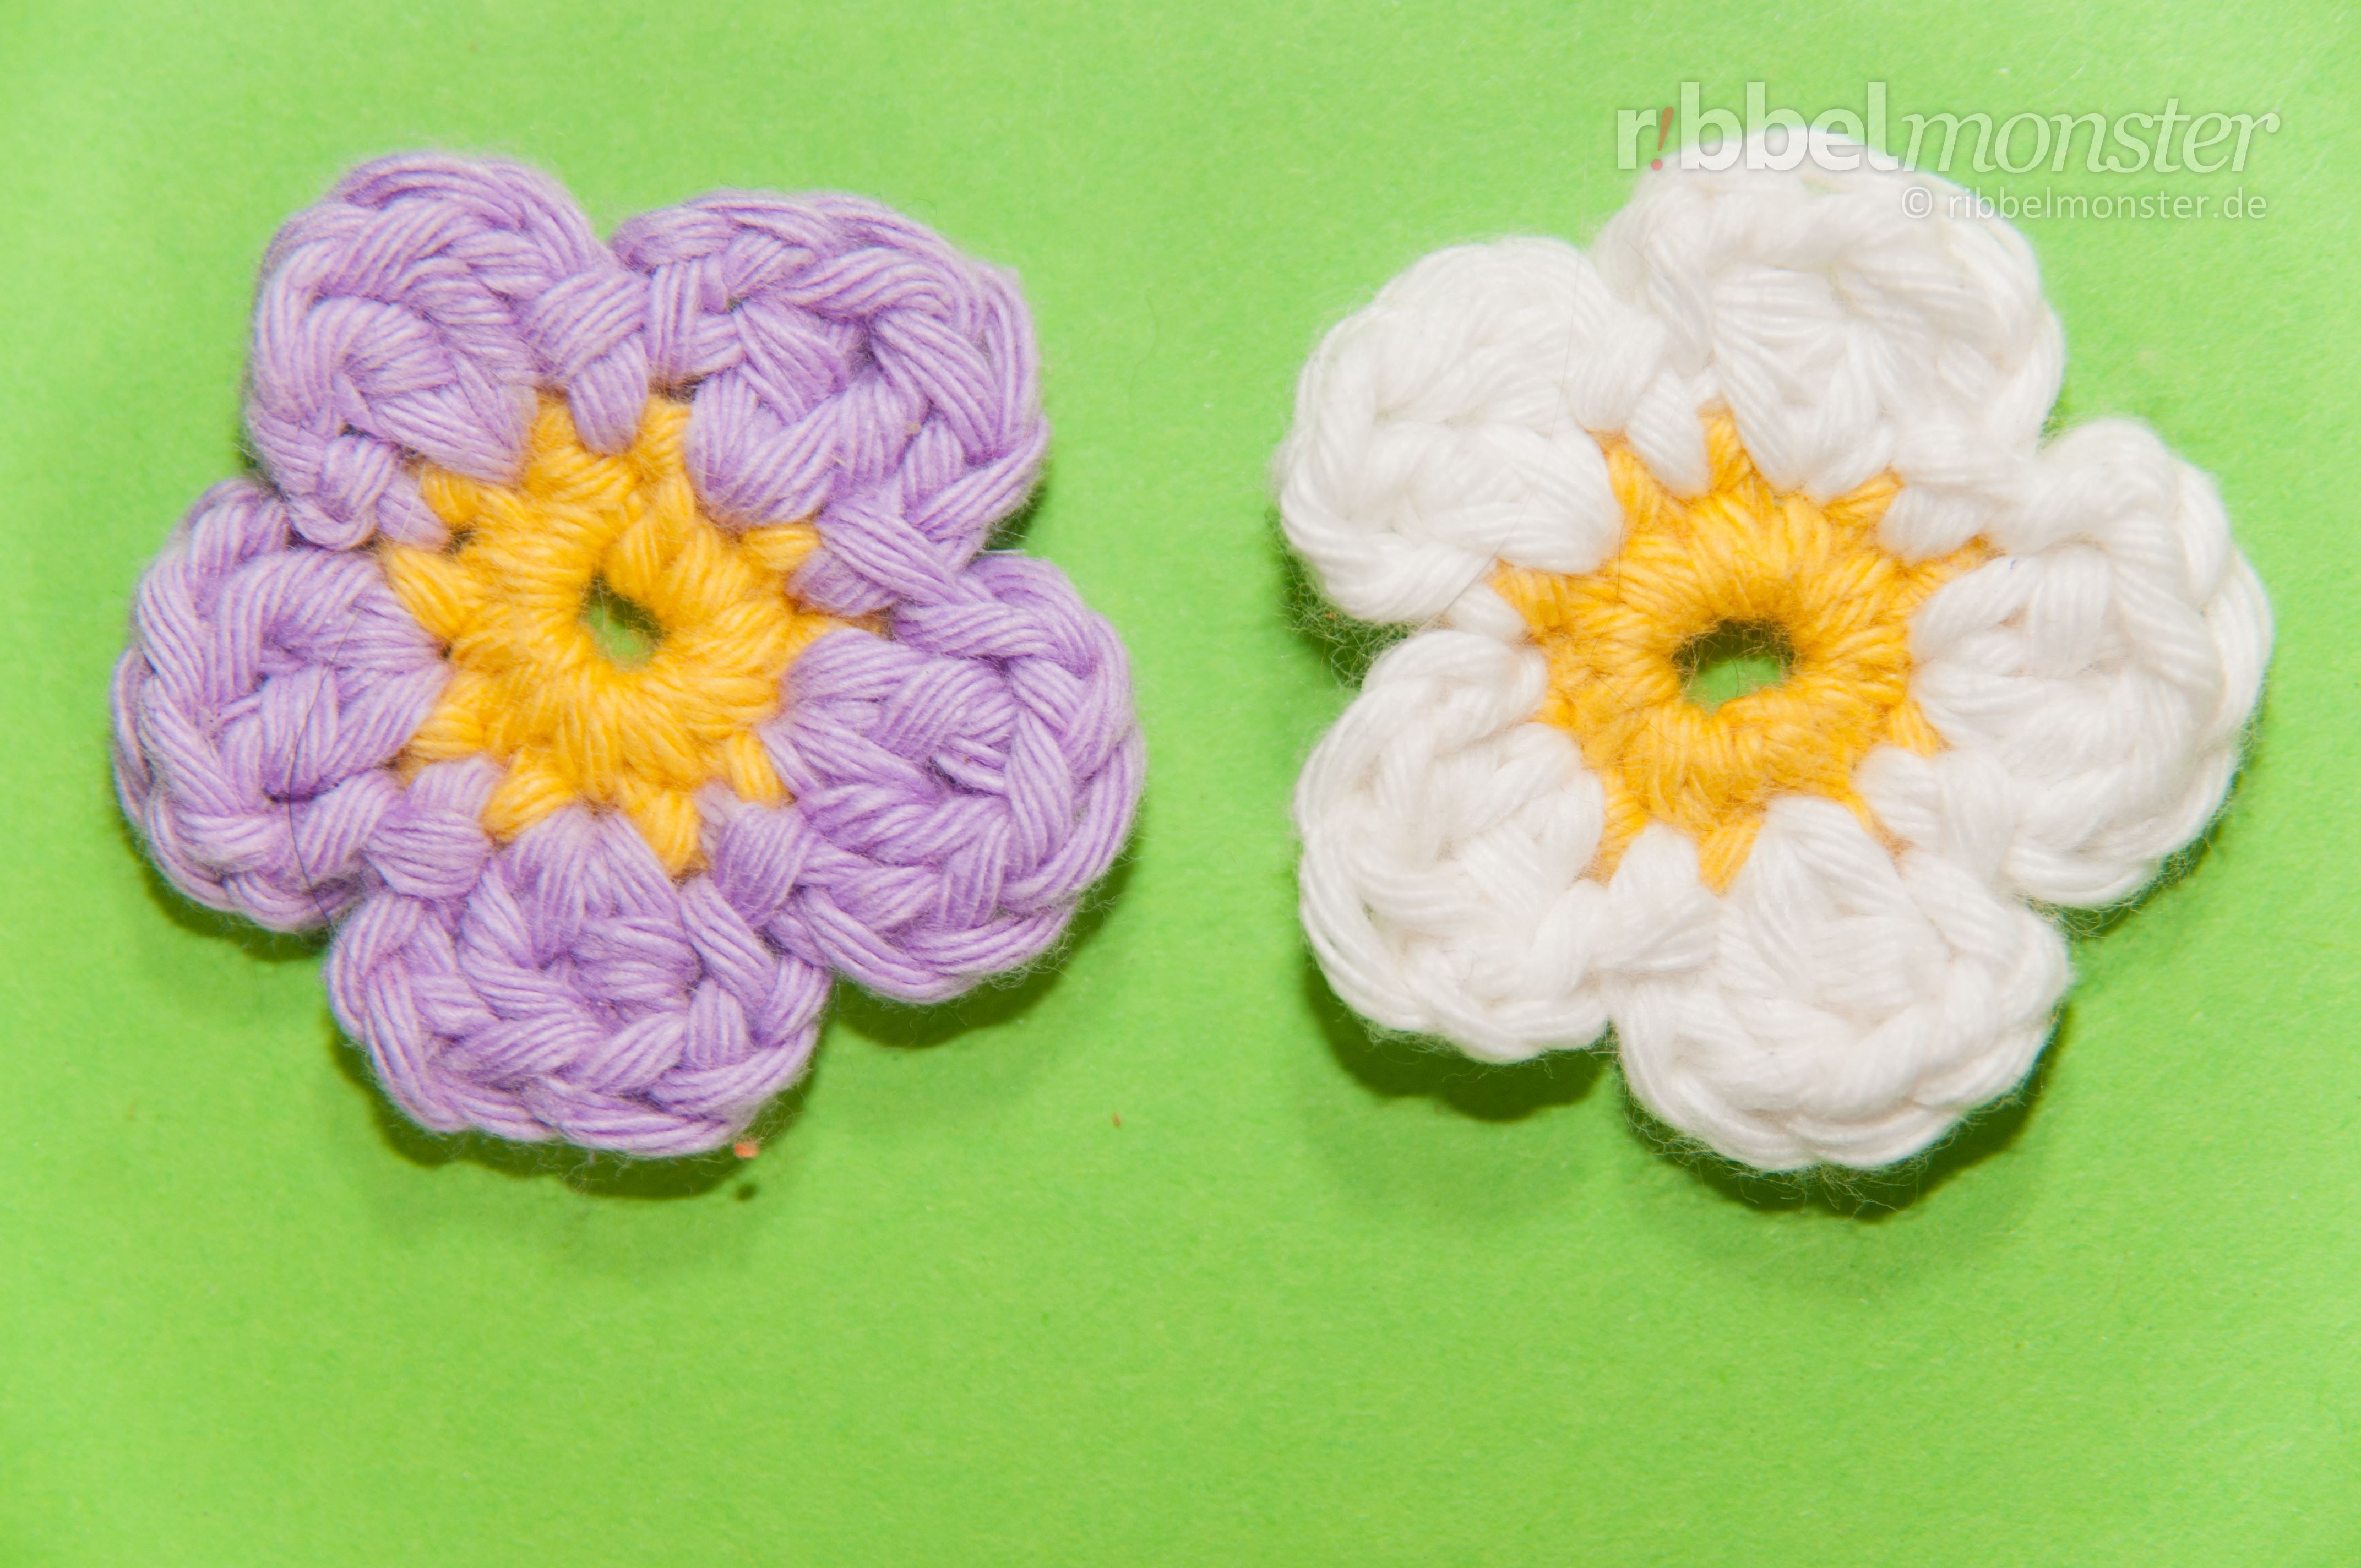 Blüten häkeln - Anleitung, Häkelanleitung | Flor en crocheth ...